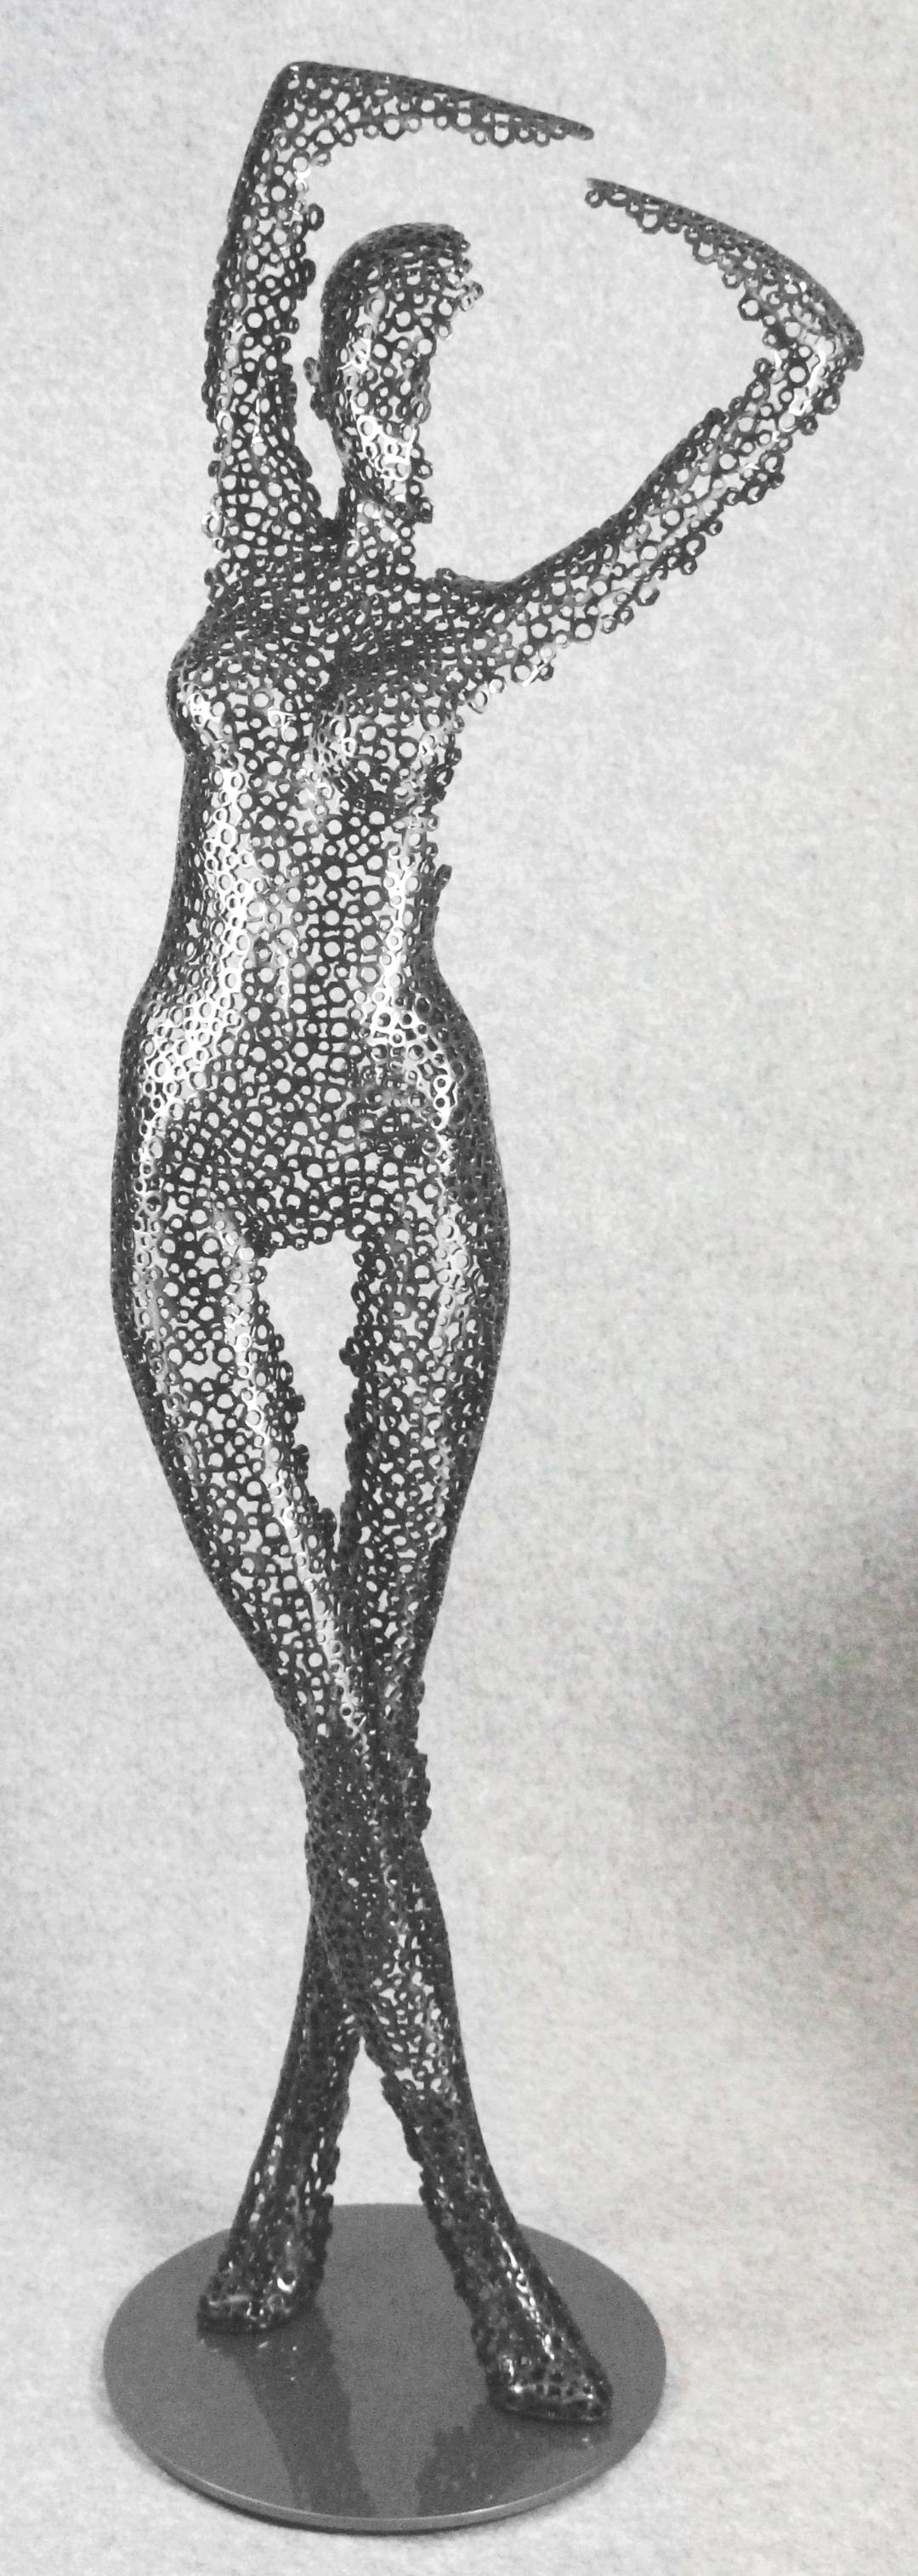 VYKI - Délicatesse (Silver) , 4506-011-031